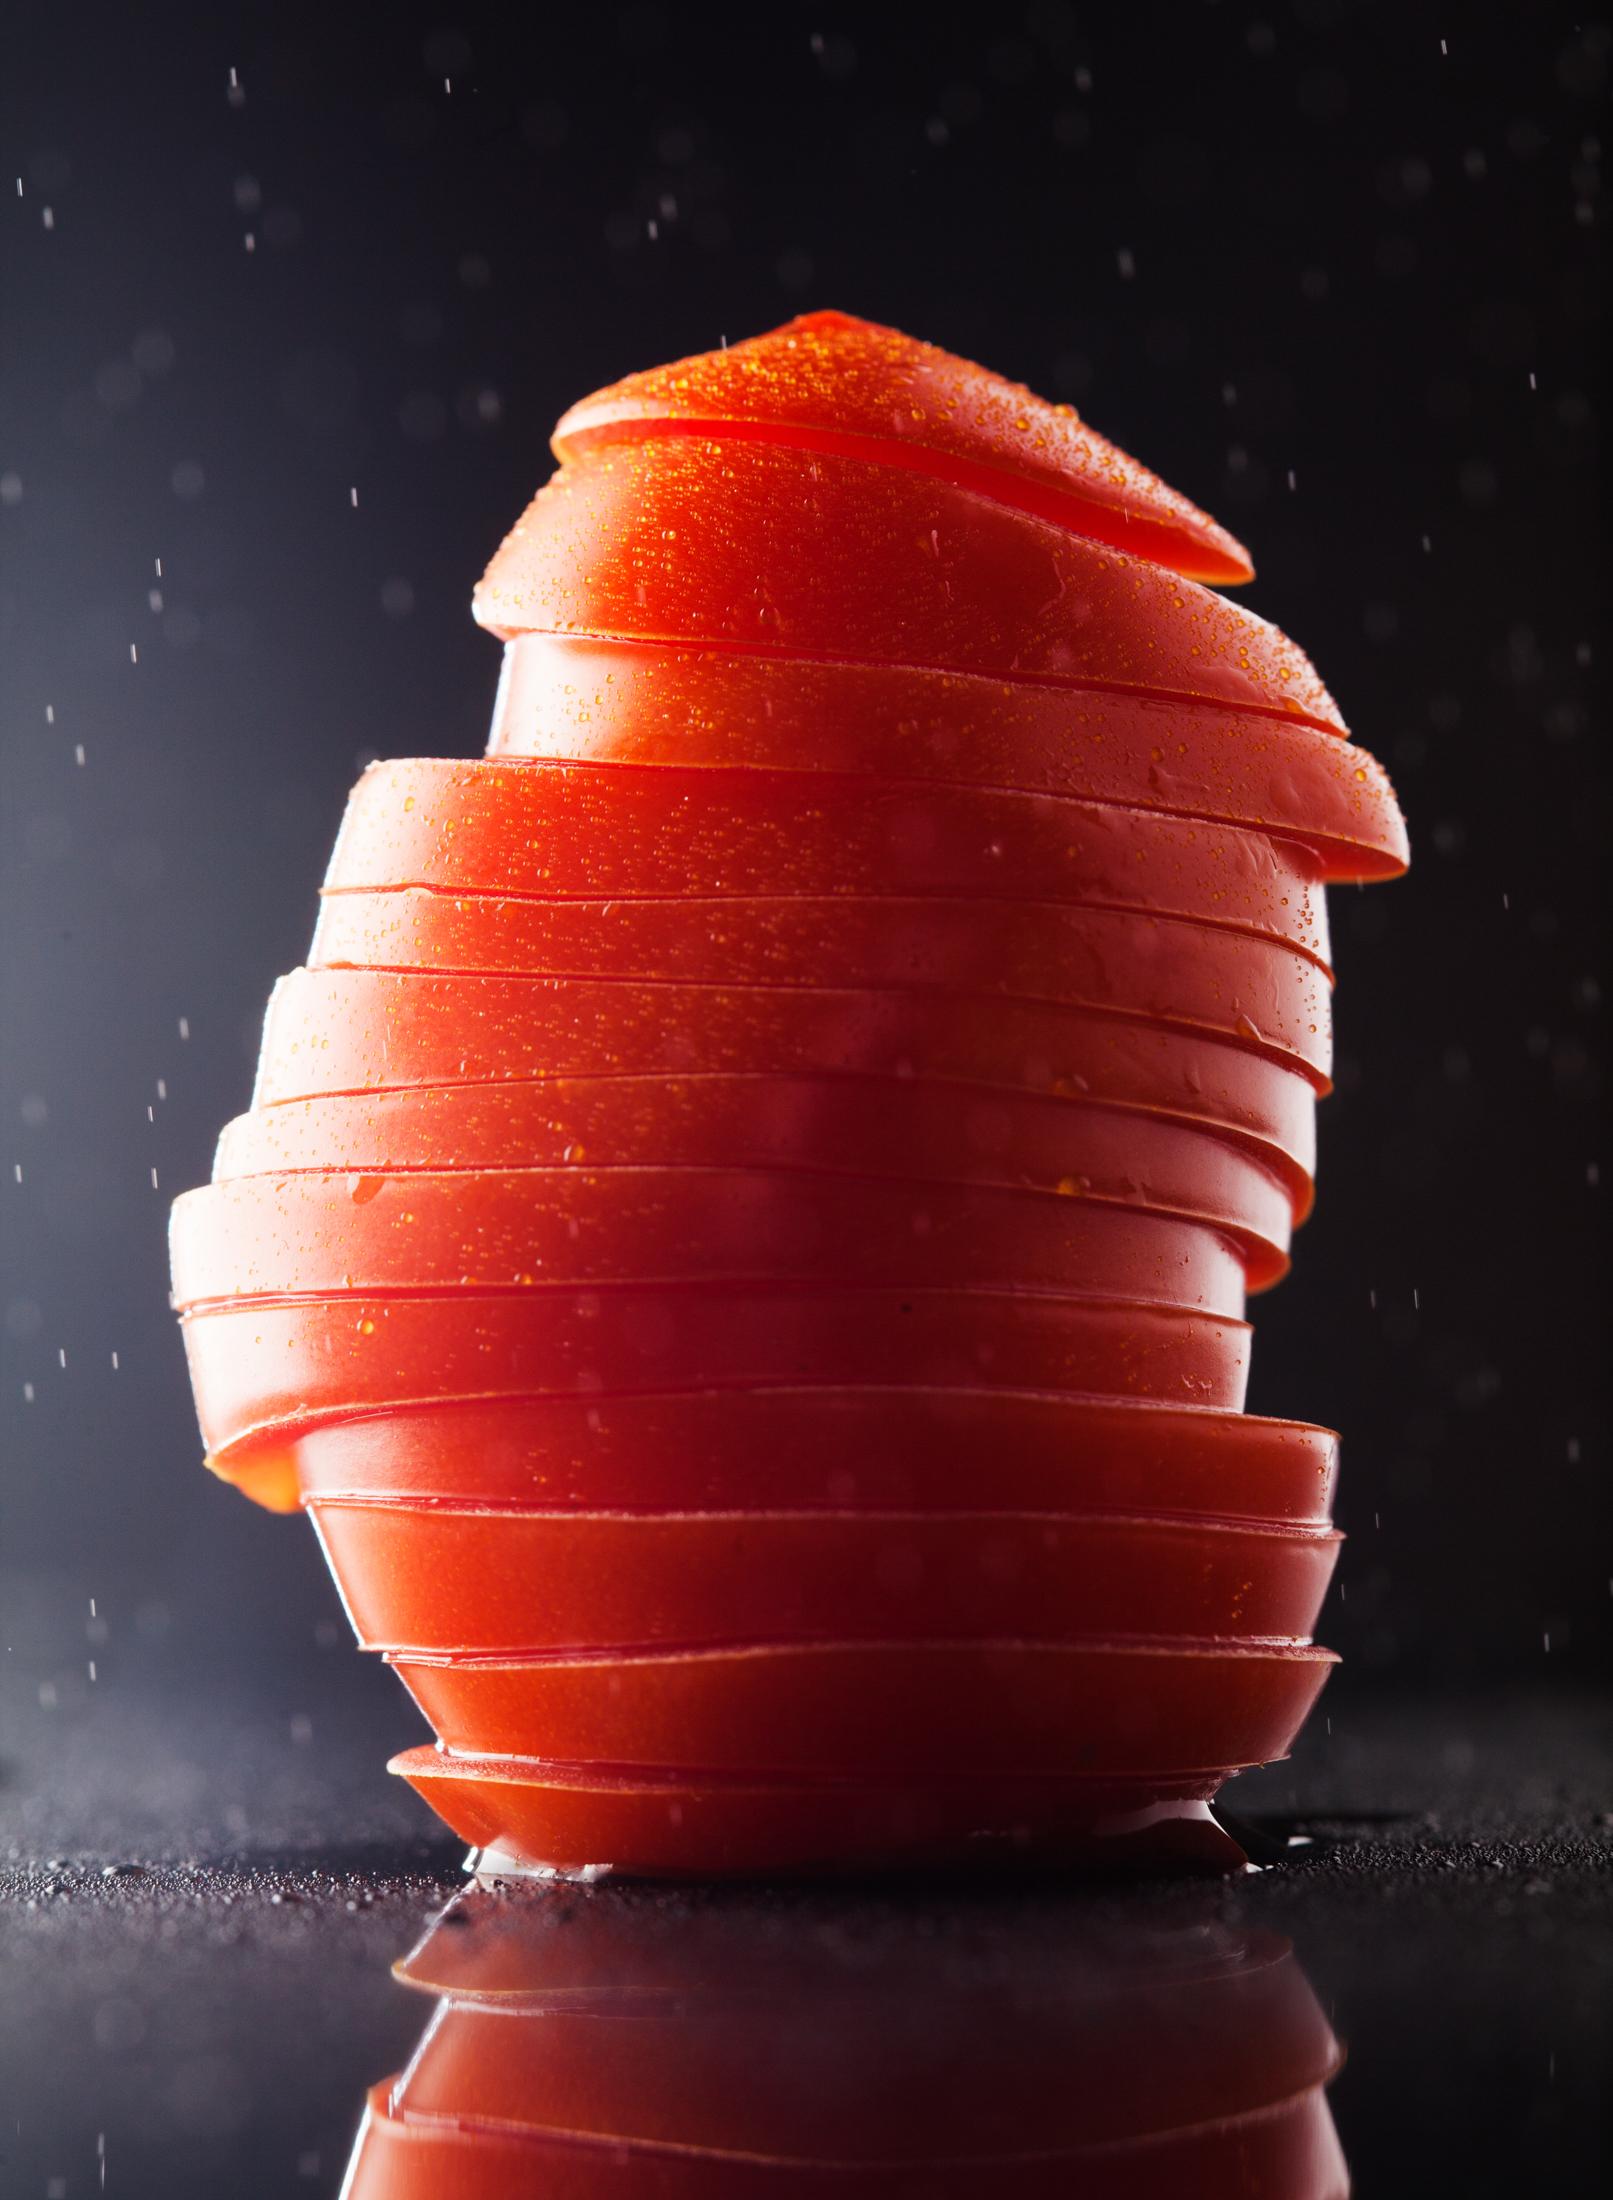 Tomatoes_17.jpg